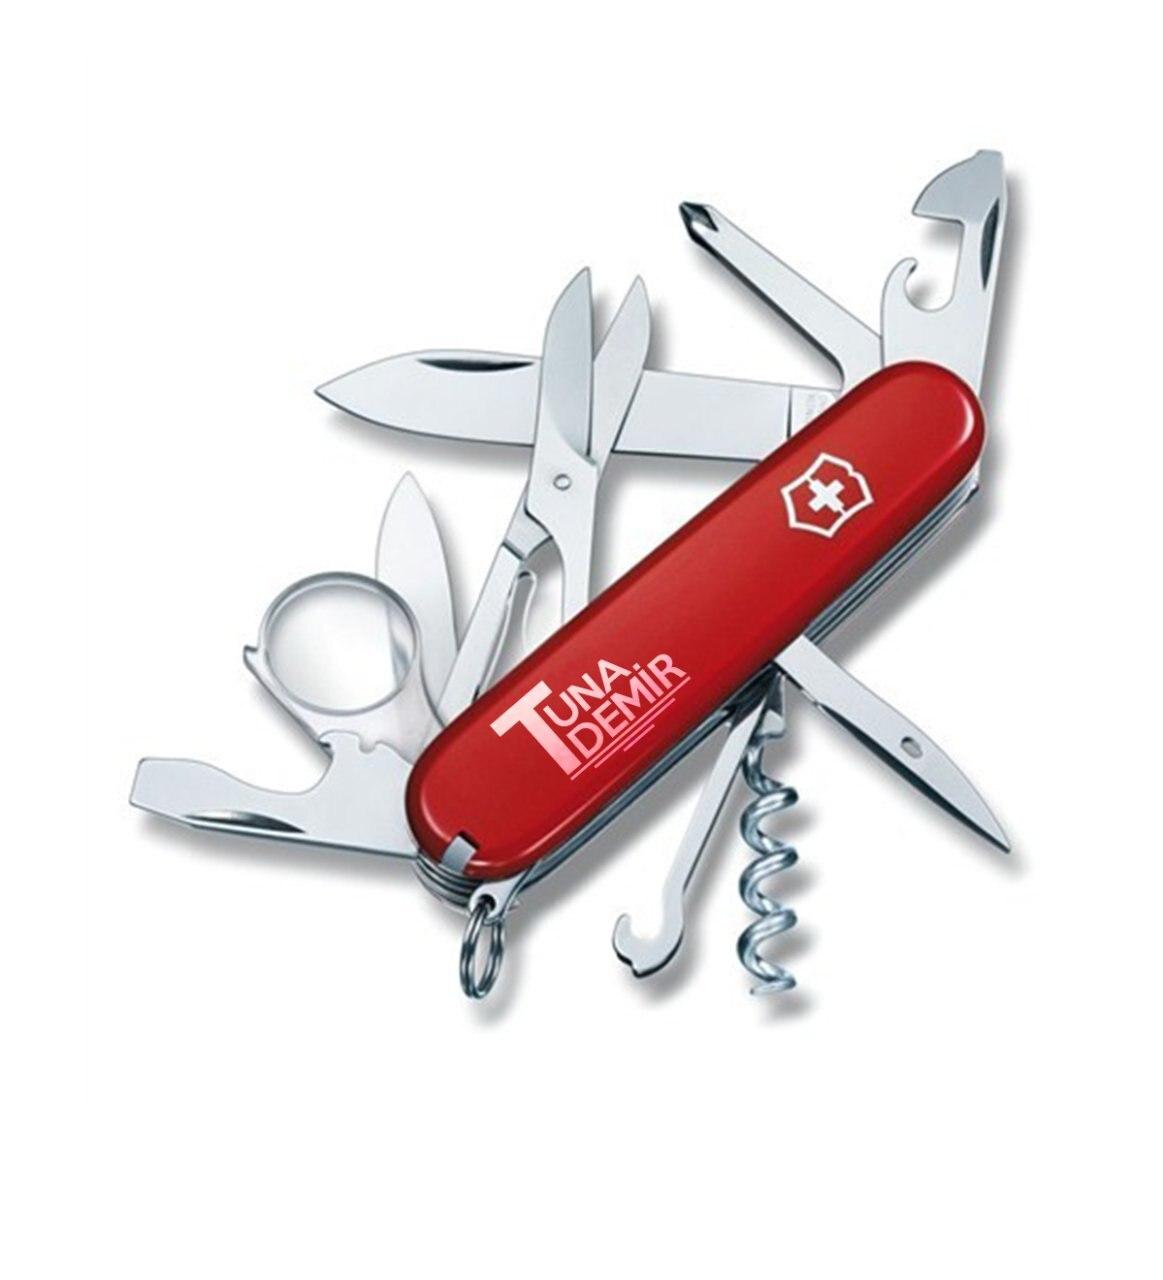 Personalized Victorinox Explorer Pocketknife